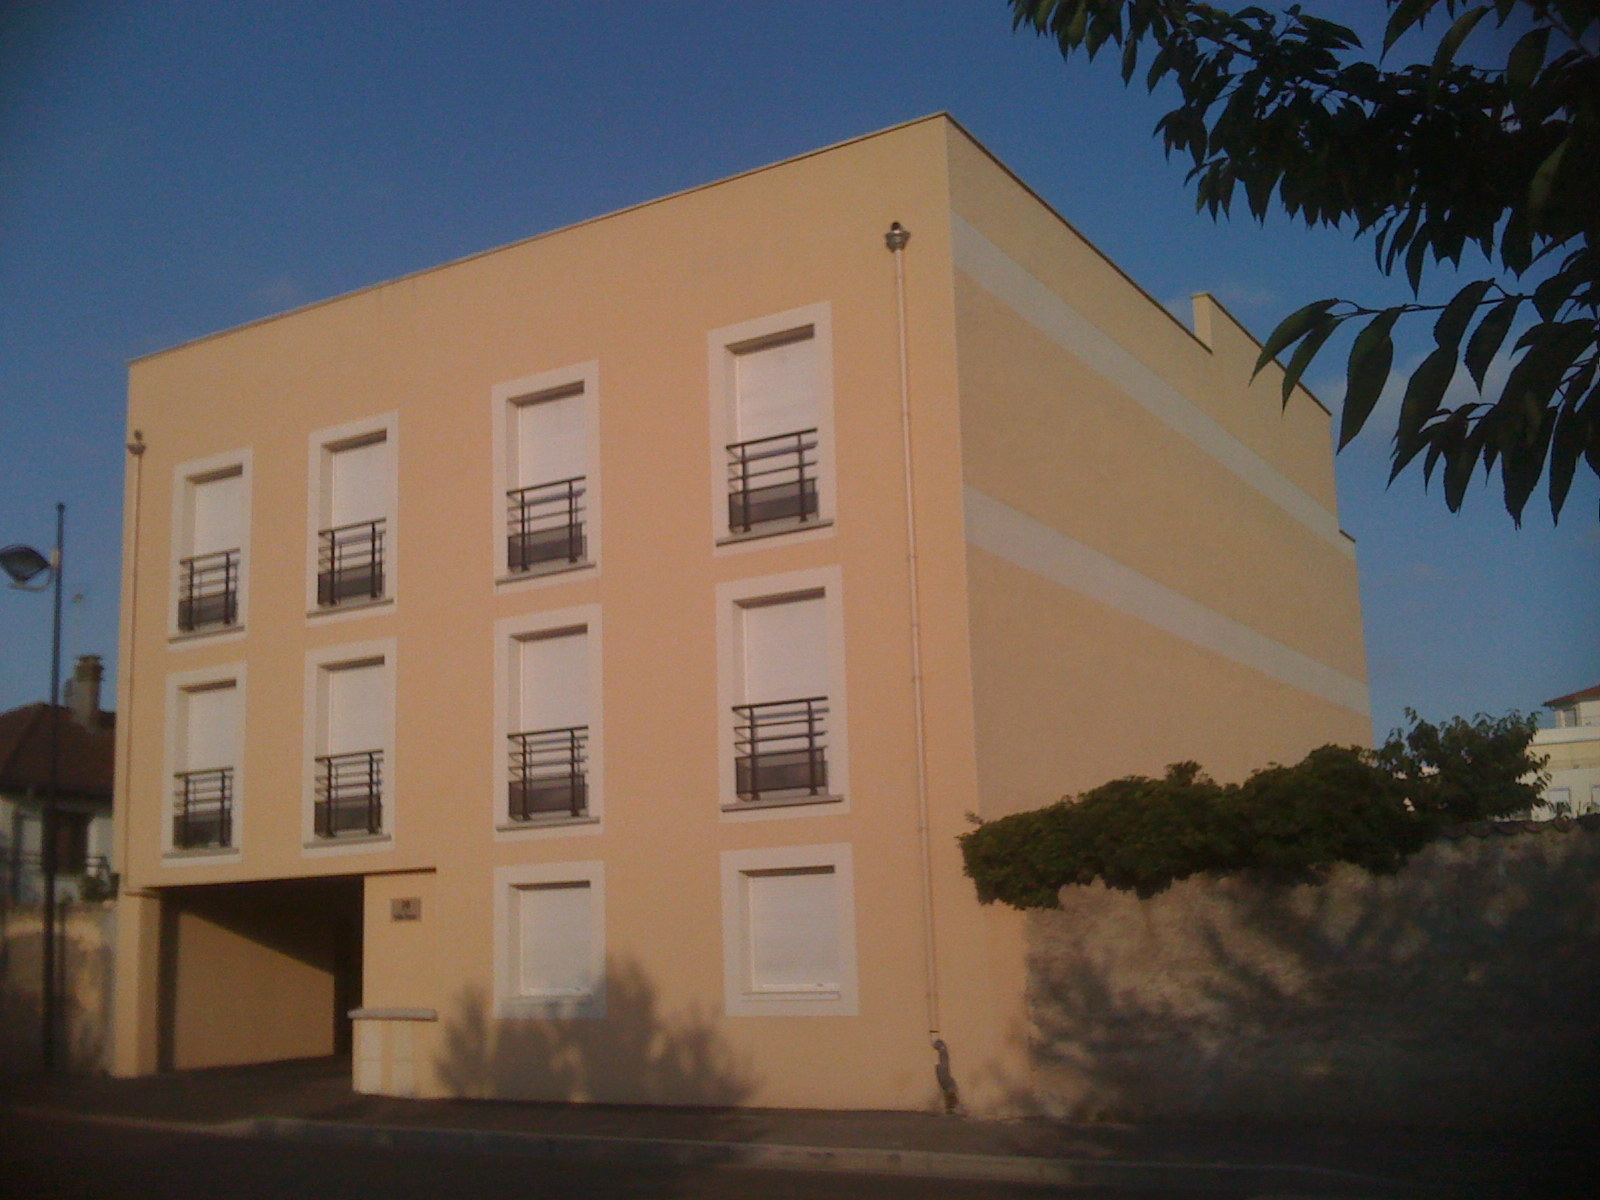 Appartement à Meyzieu - La villa Fusier - Meyzieu centre